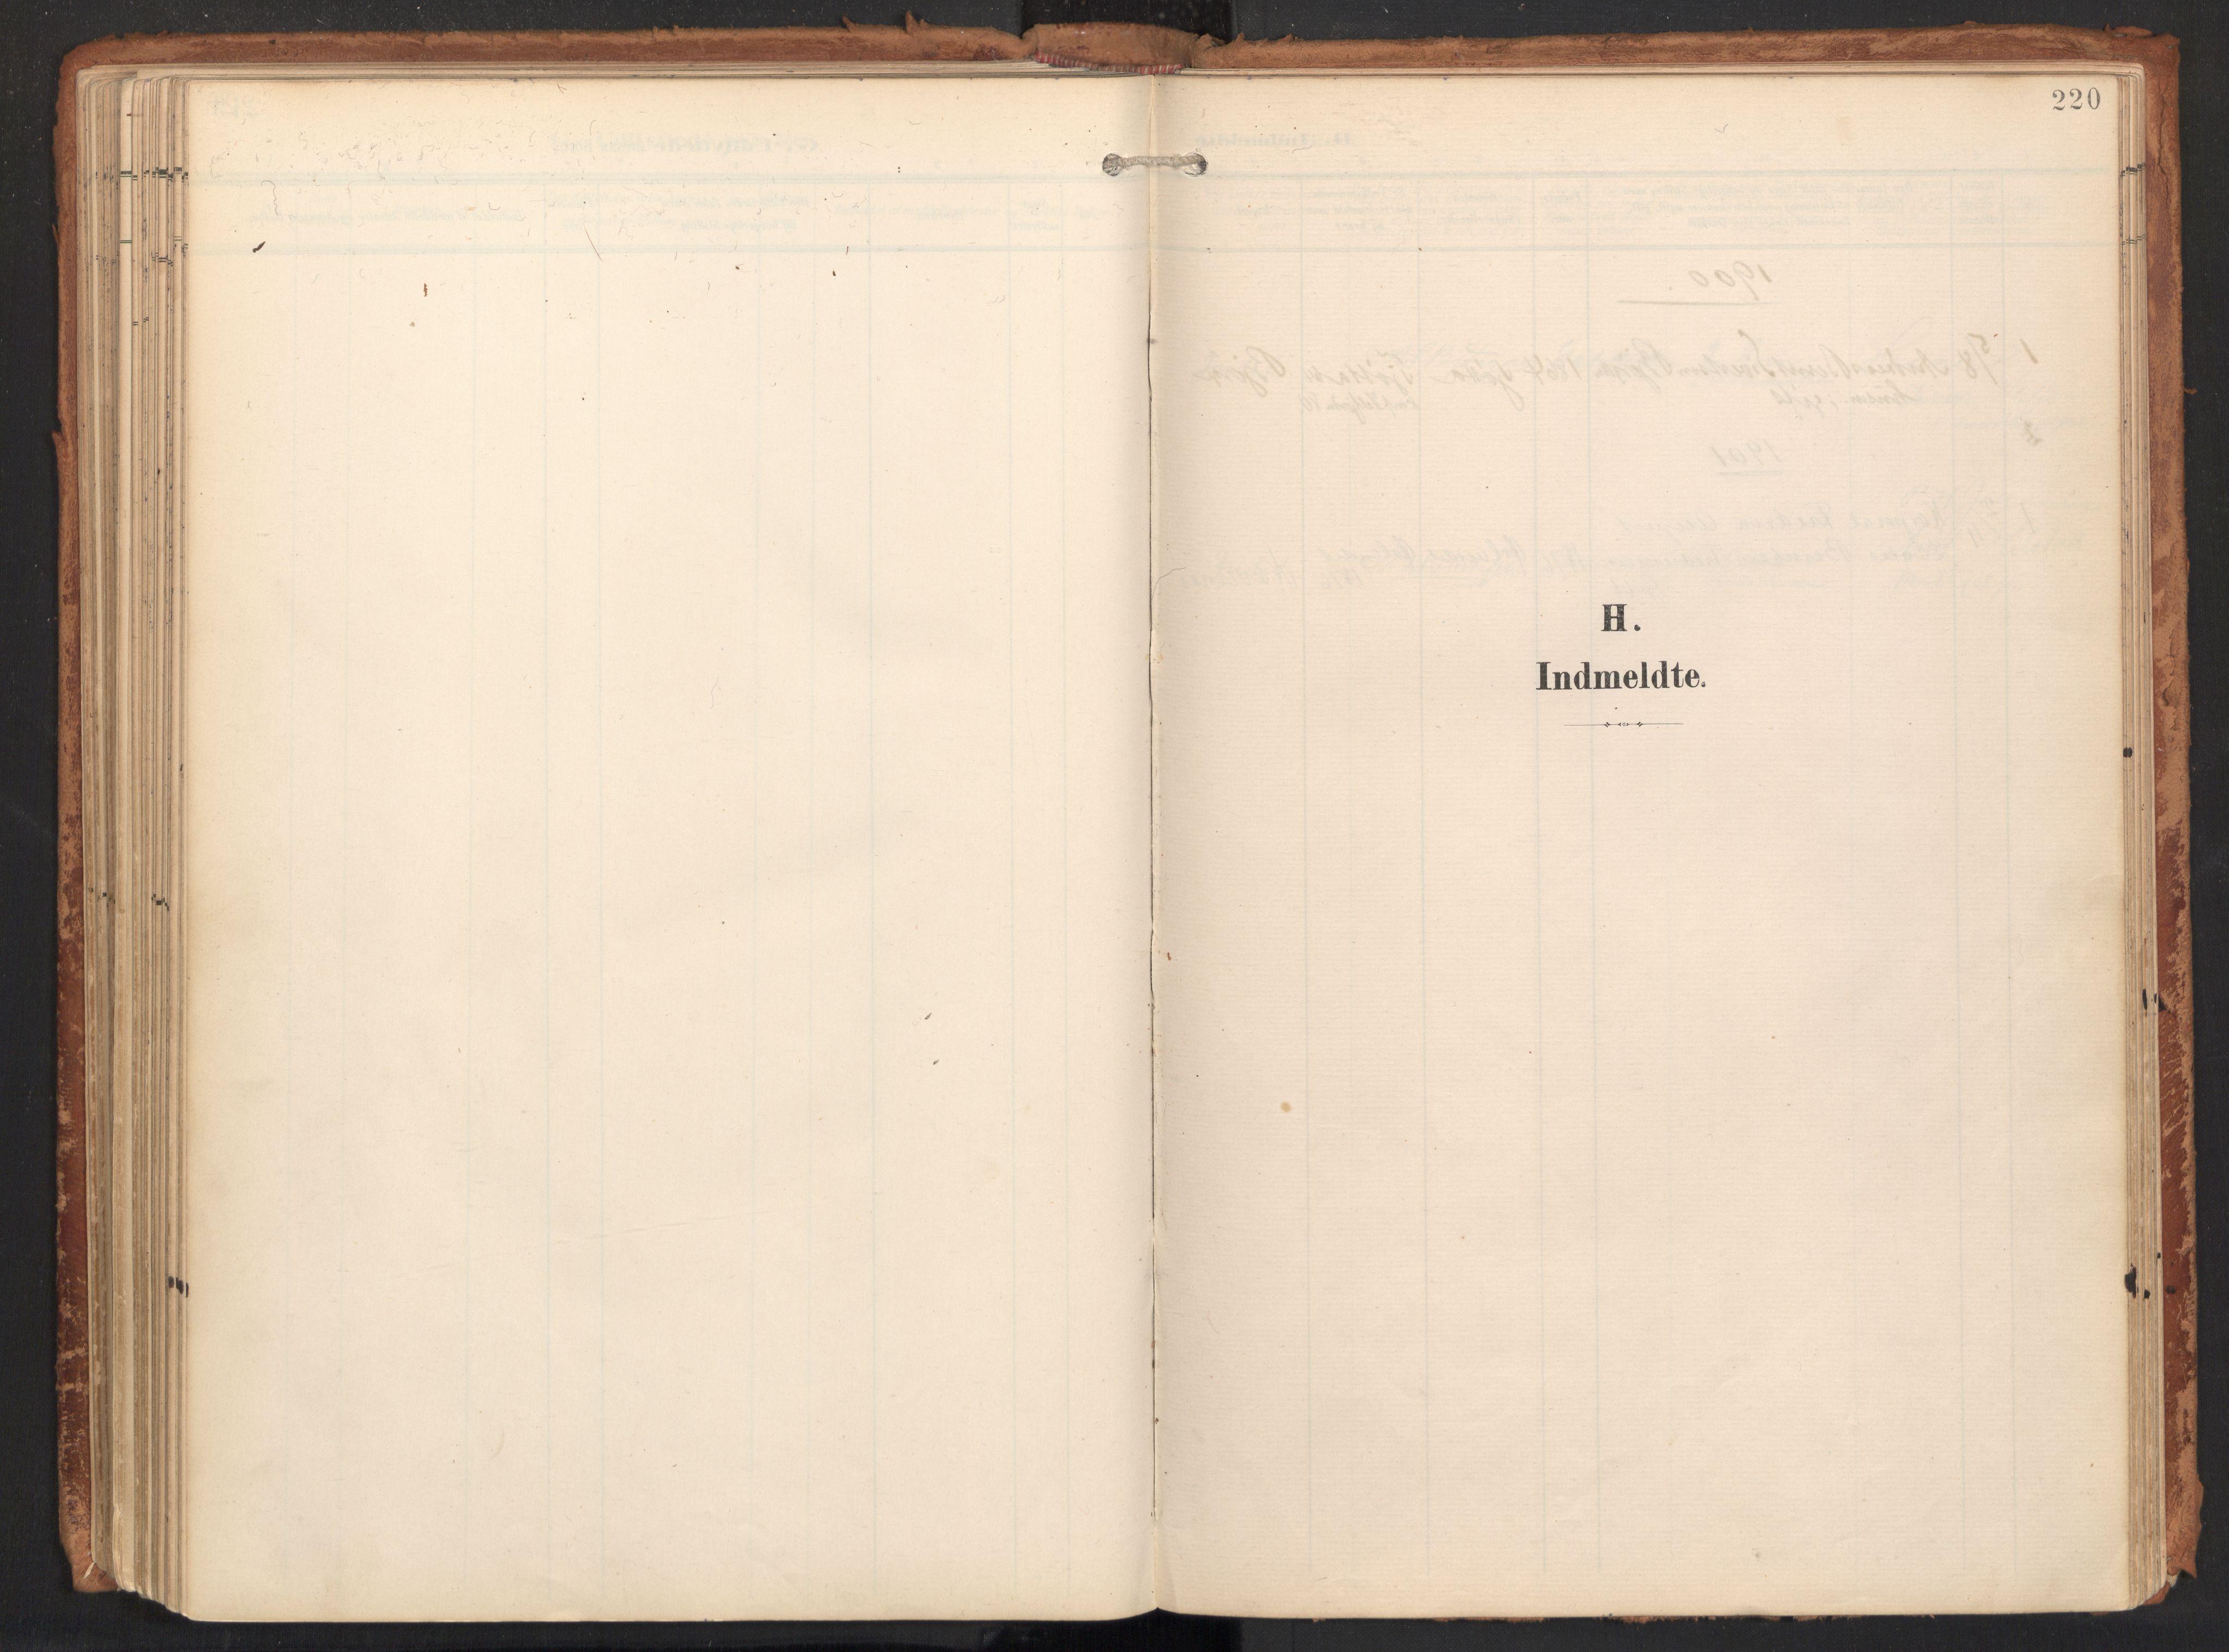 SAT, Ministerialprotokoller, klokkerbøker og fødselsregistre - Nordland, 814/L0227: Ministerialbok nr. 814A08, 1899-1920, s. 220